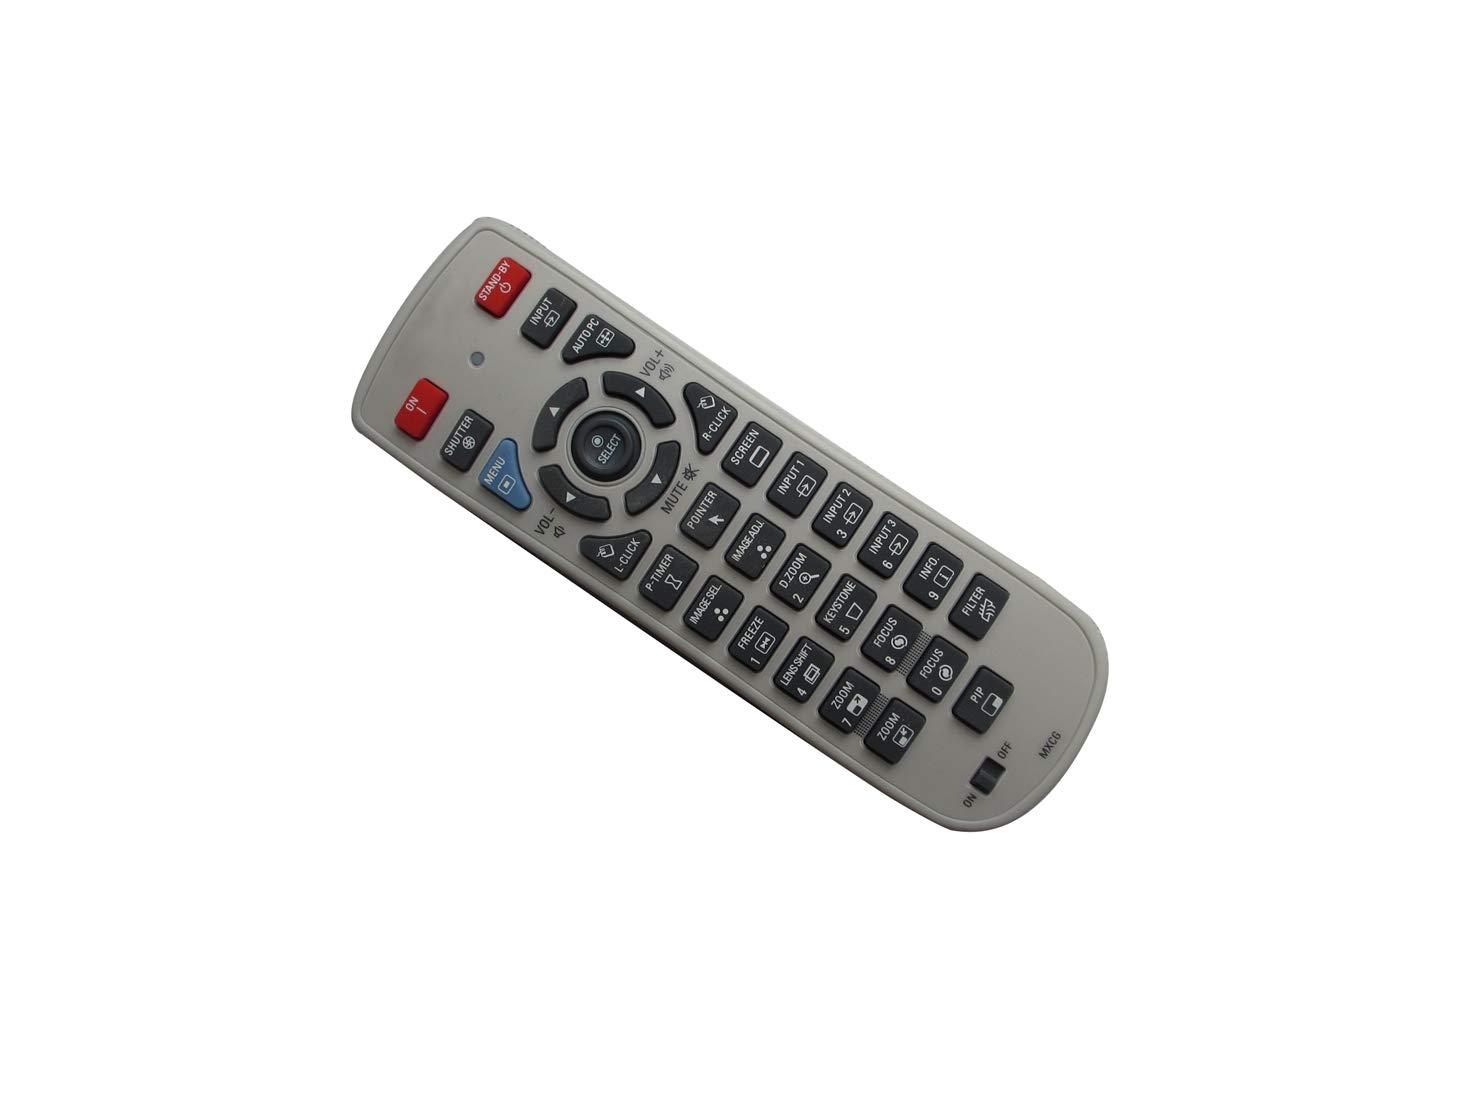 Remote Control For Sanyo PLC-ZM5000L PLC-XM150L PDG-DXT10 PLC-WTC500AL 3LCD Projector HCDZ HCDZ-X18298